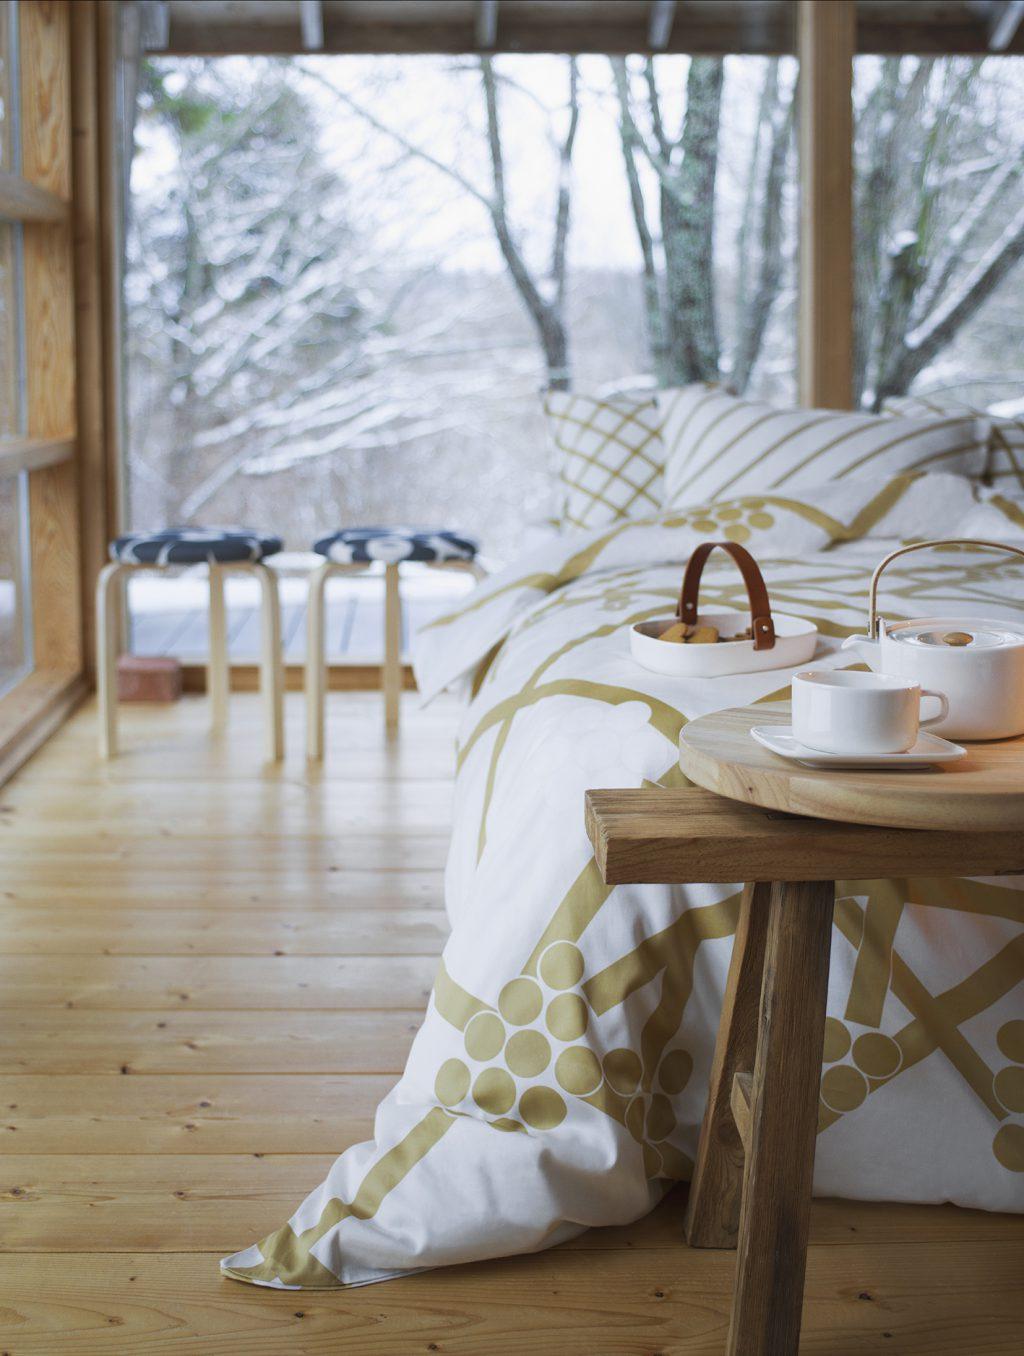 Marimekko home Christmas 2017 for Marimekko by Susanna Vento